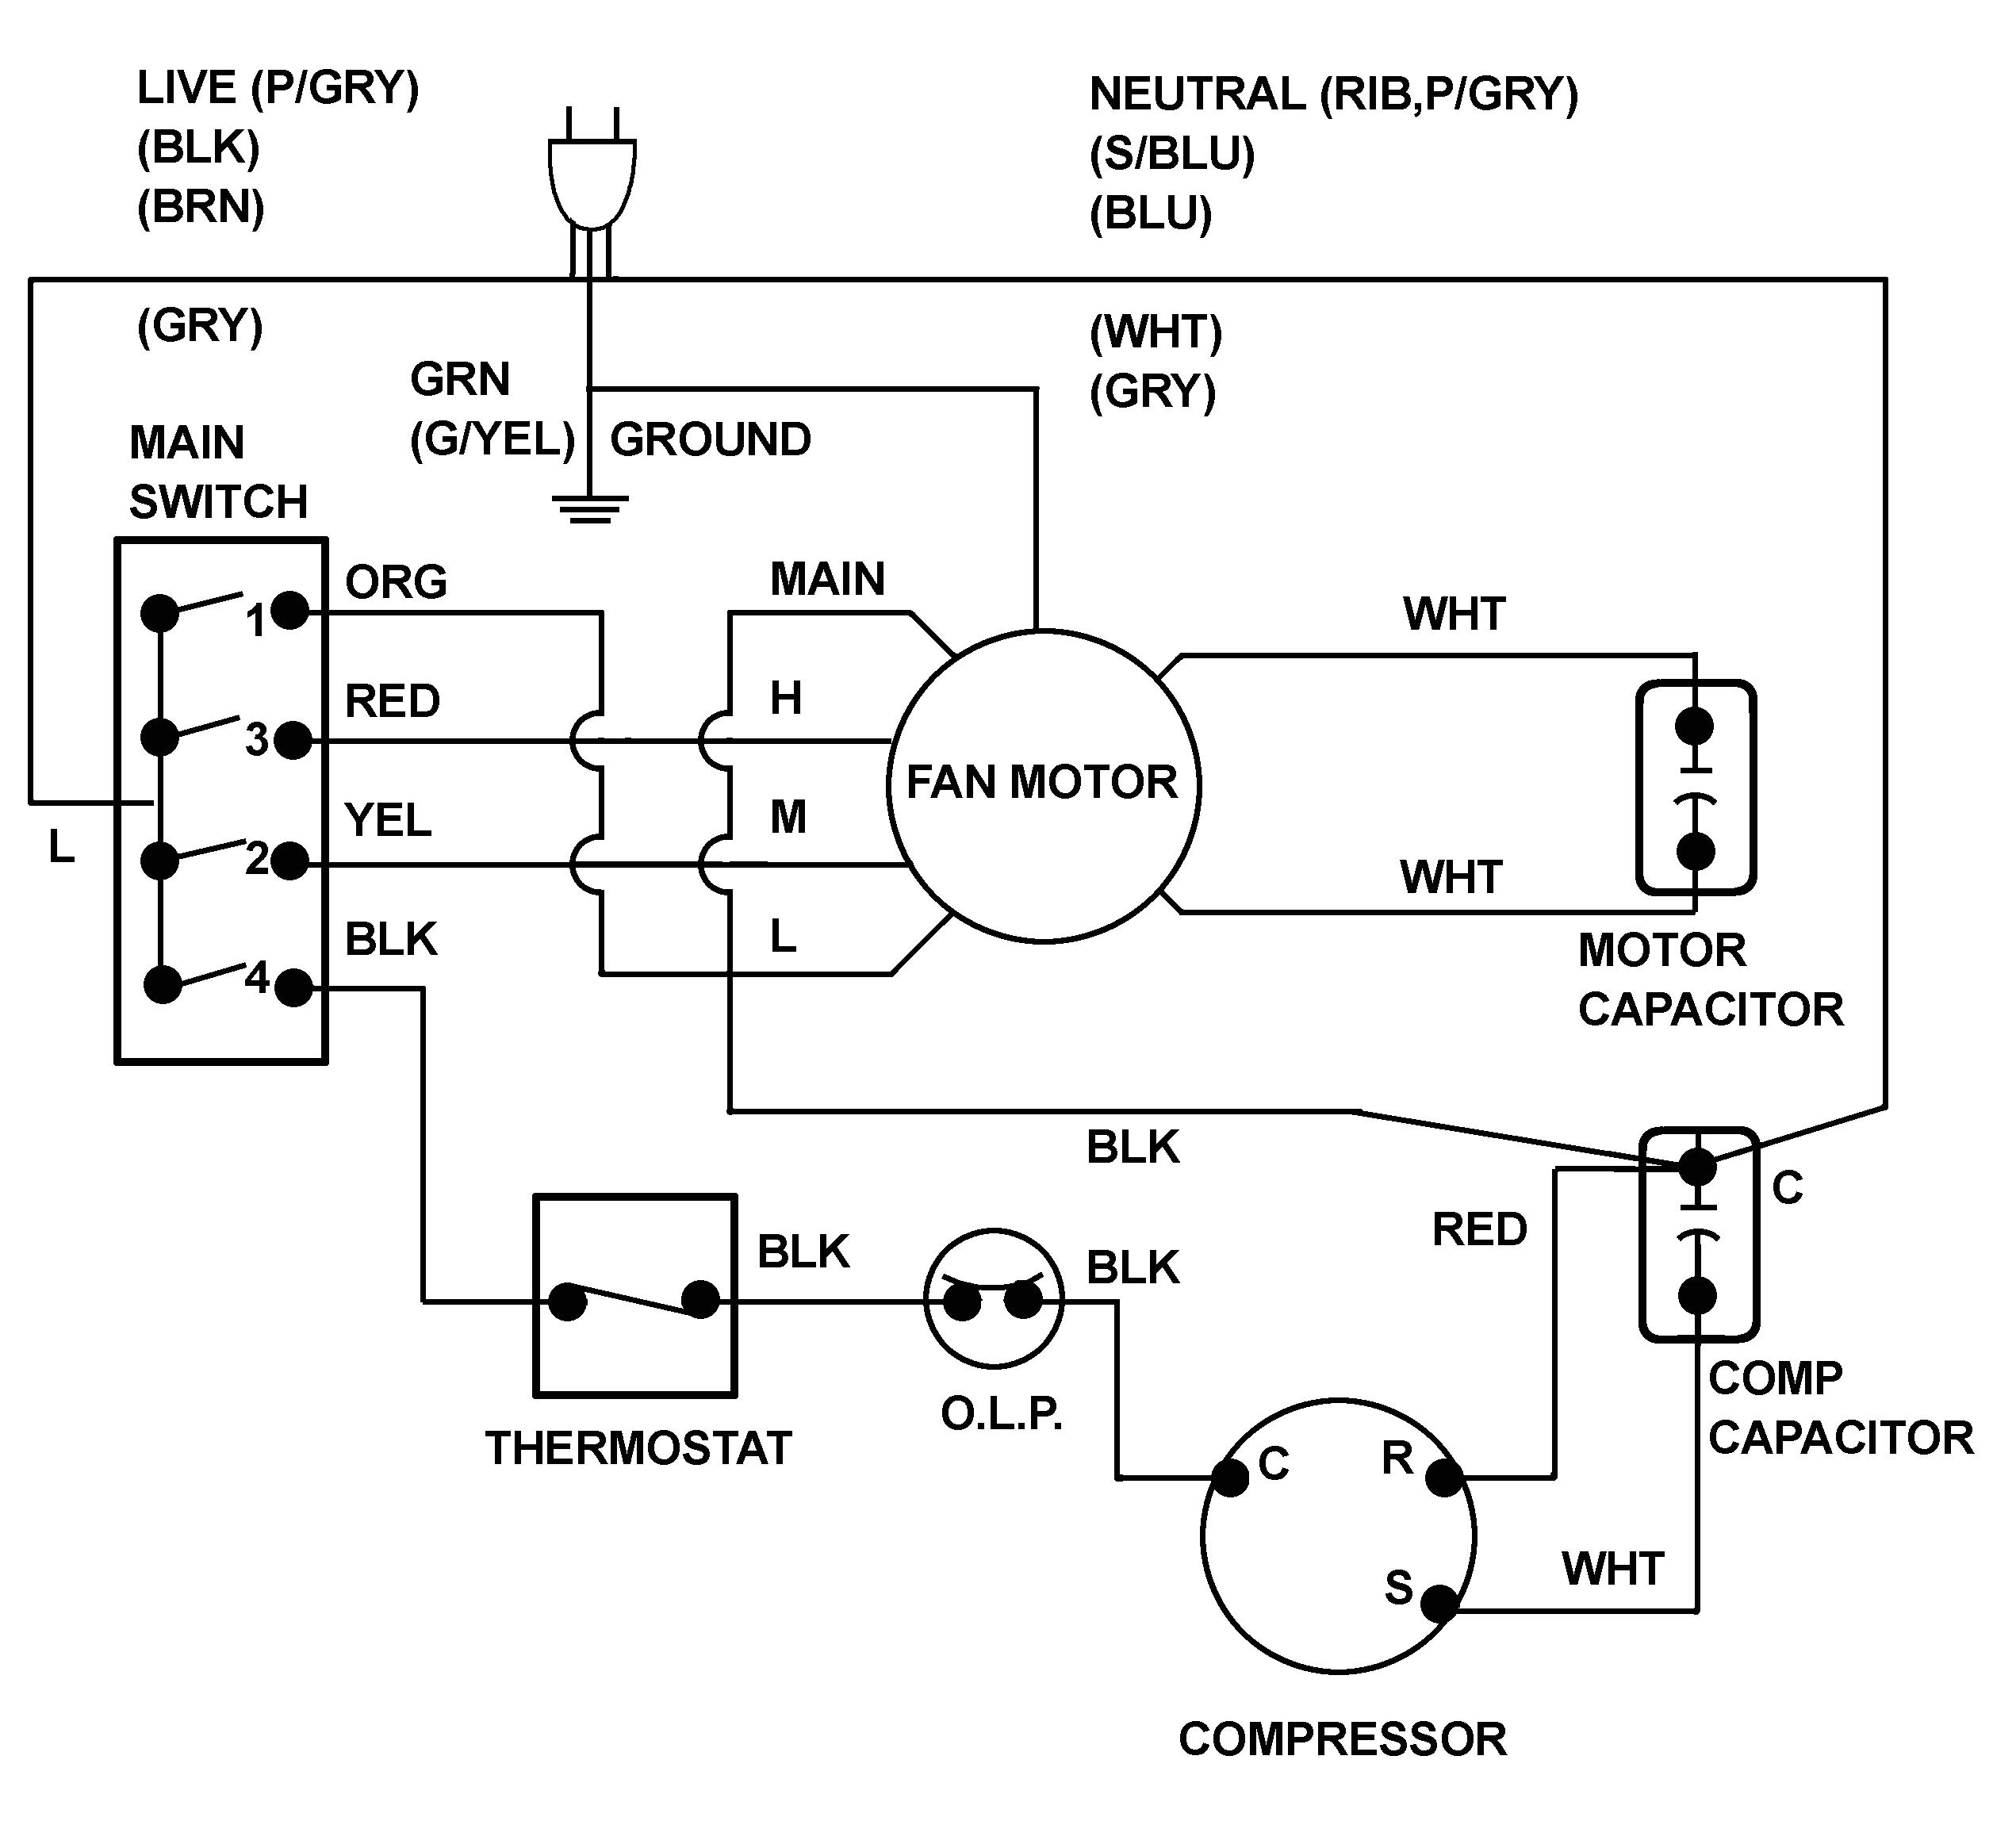 fan coil unit wiring diagram blog wiring diagram diagram for wiring a 240 a c unit 24hx8